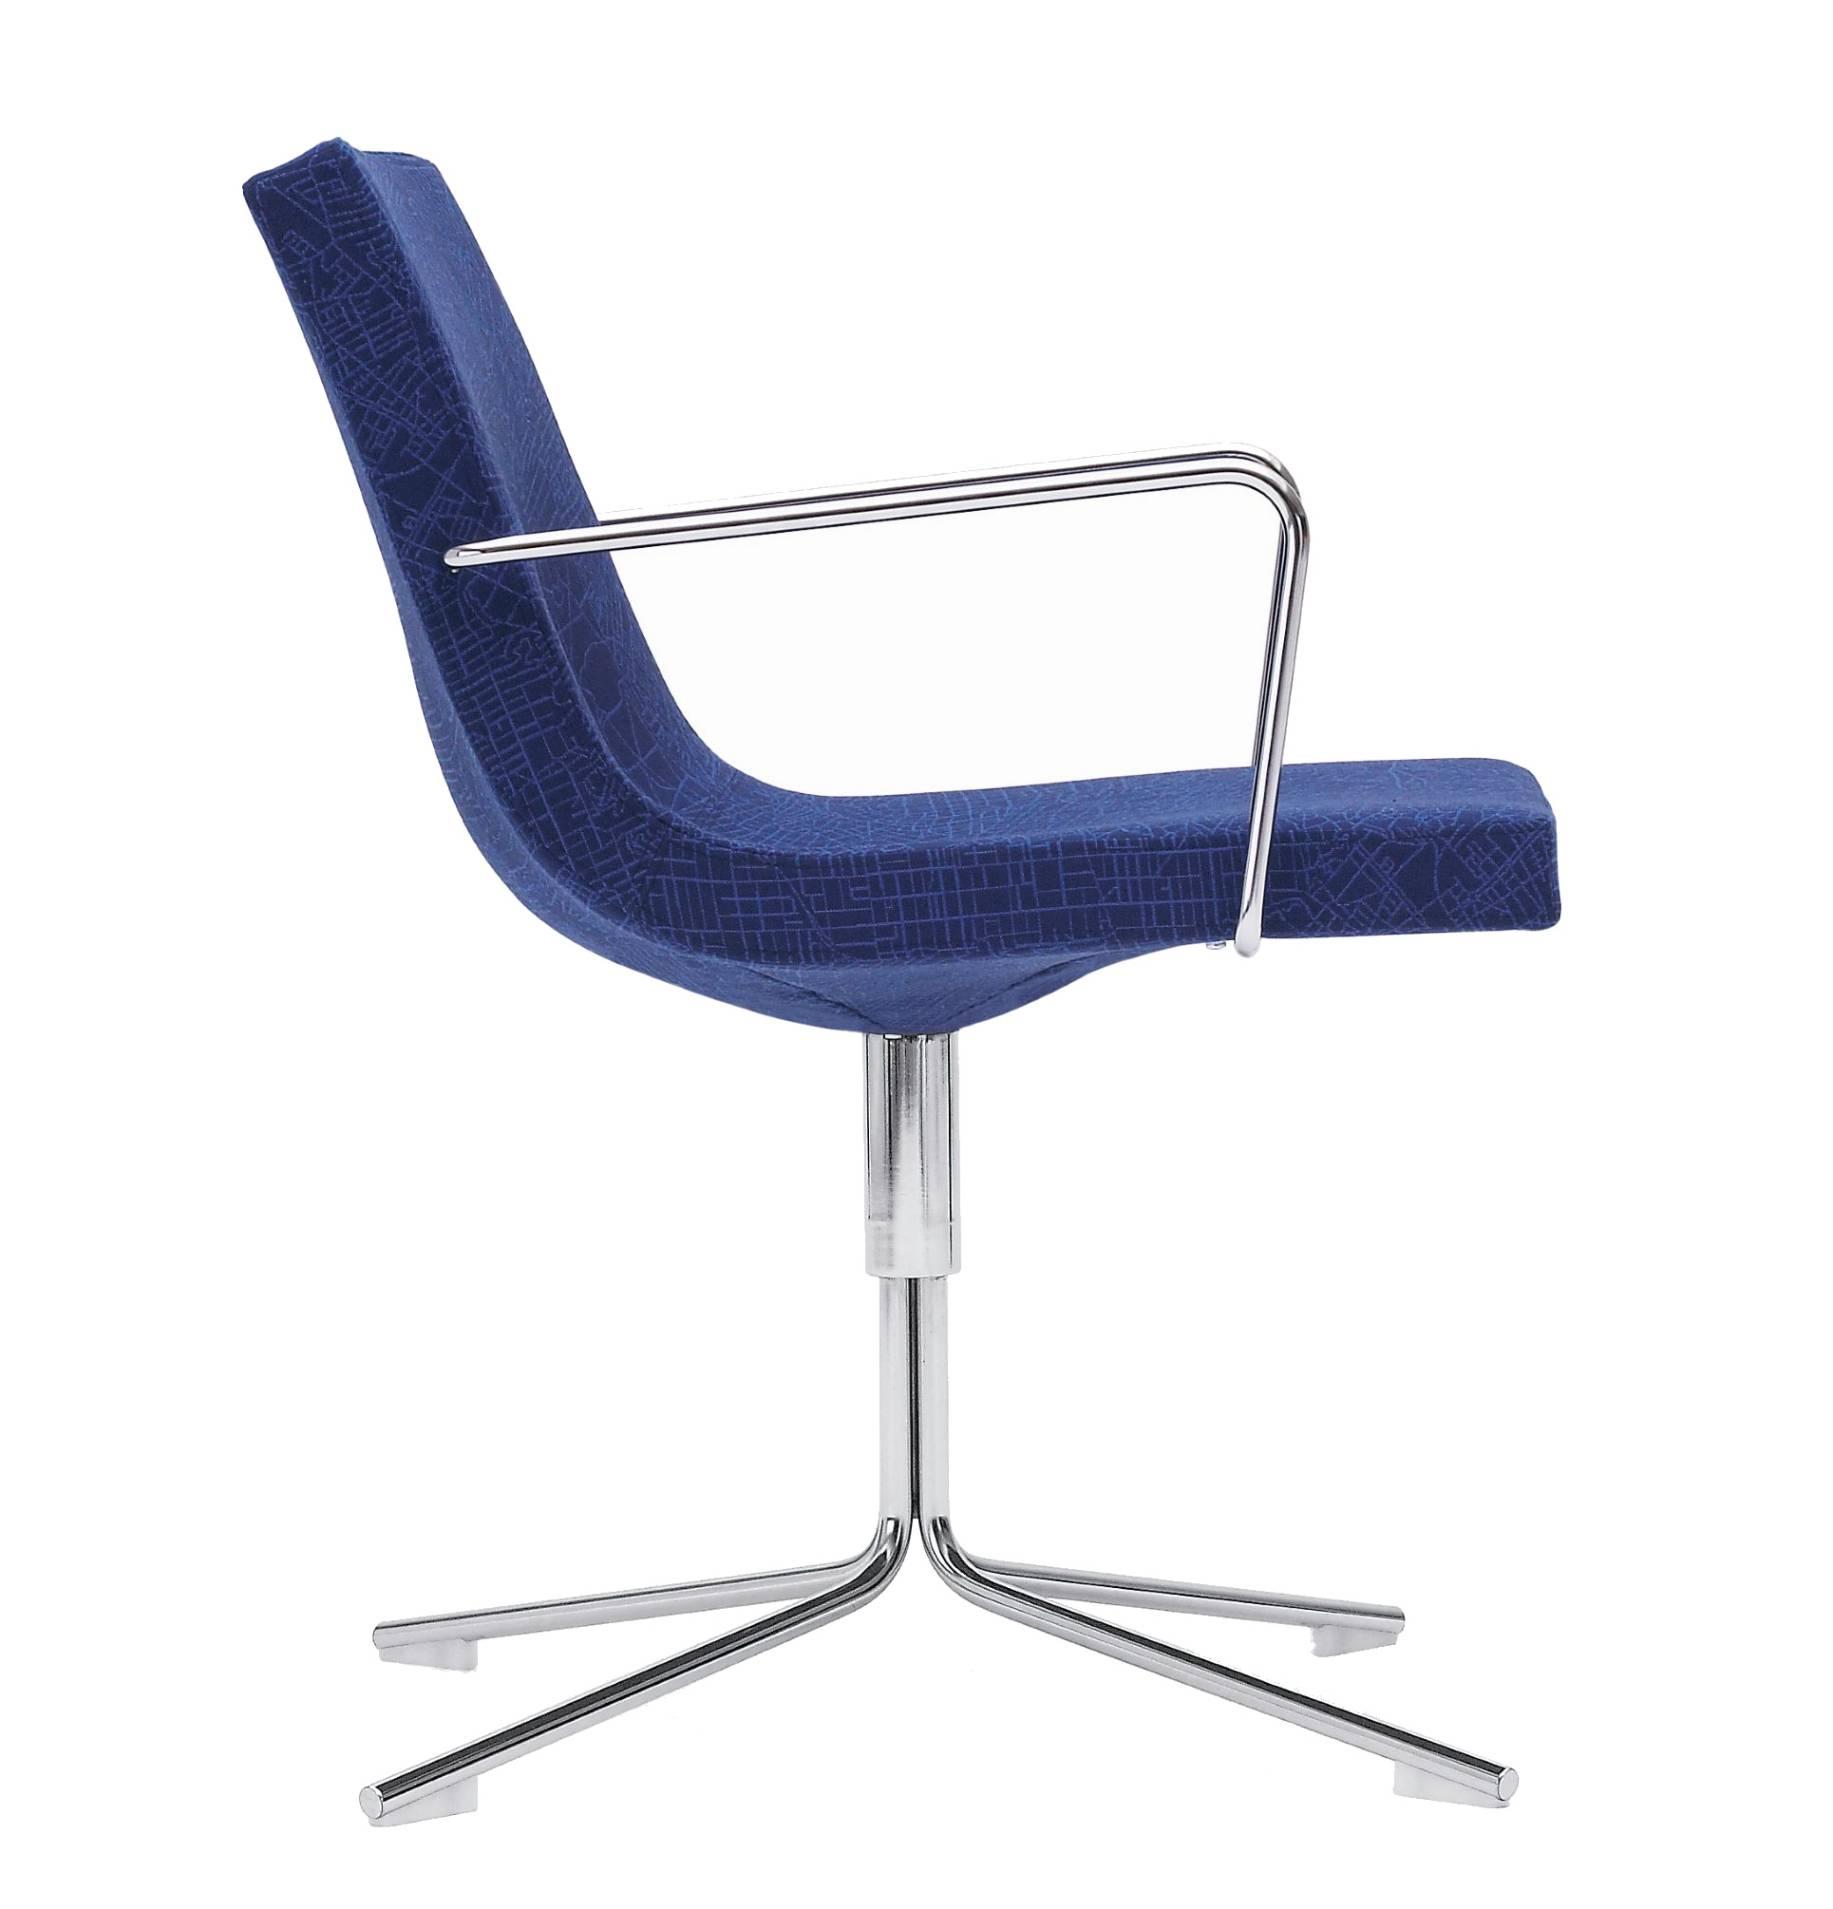 Offecct Bond Armlehnstuhl in der Farbe Blau